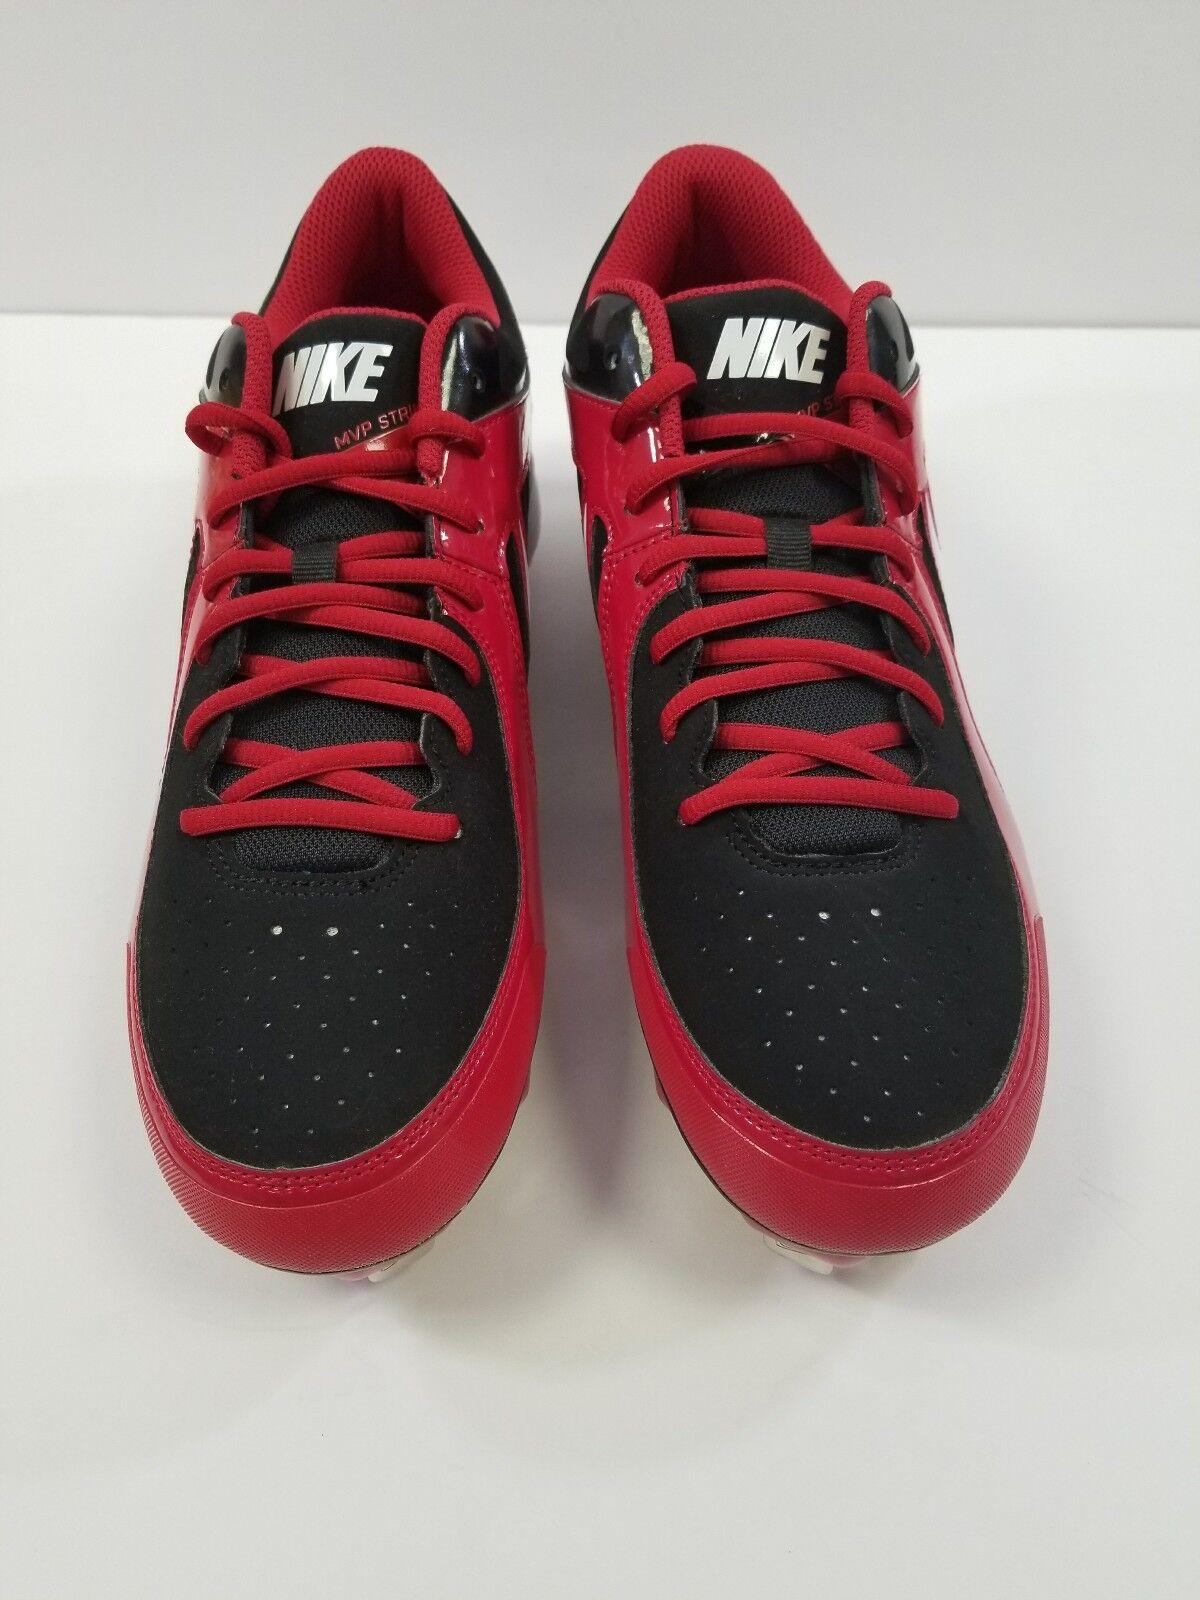 Nuevo hombre Nike MVP huelga metal Baseball cleats 10,5 Rojo / negro baja 10,5 cleats a48ab6